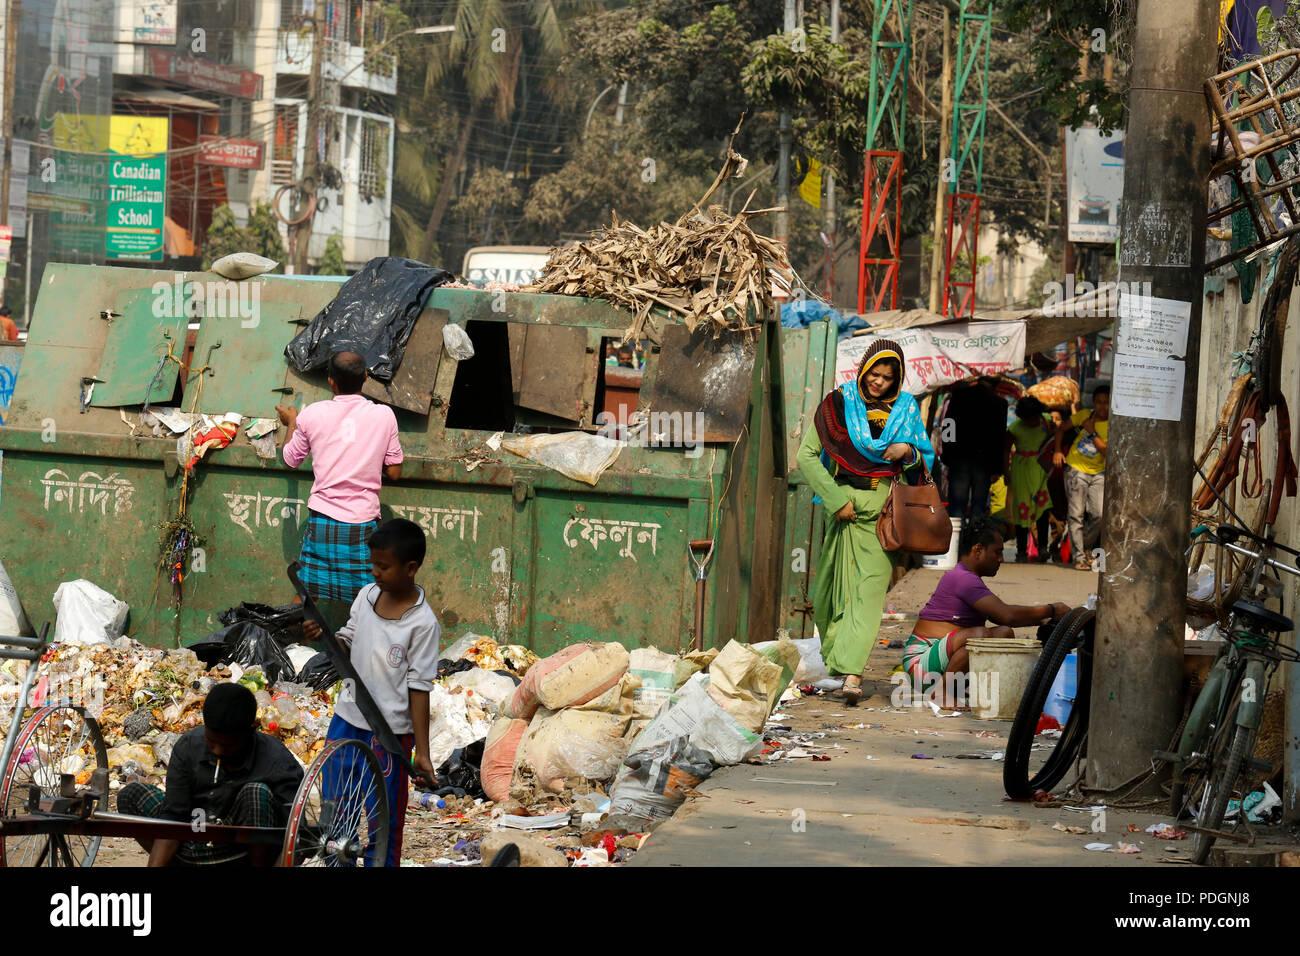 Garbage-littered on the streets is the common scenario in Dhaka, the capital city of Bangladesh. Dhaka, Bangladesh - Stock Image